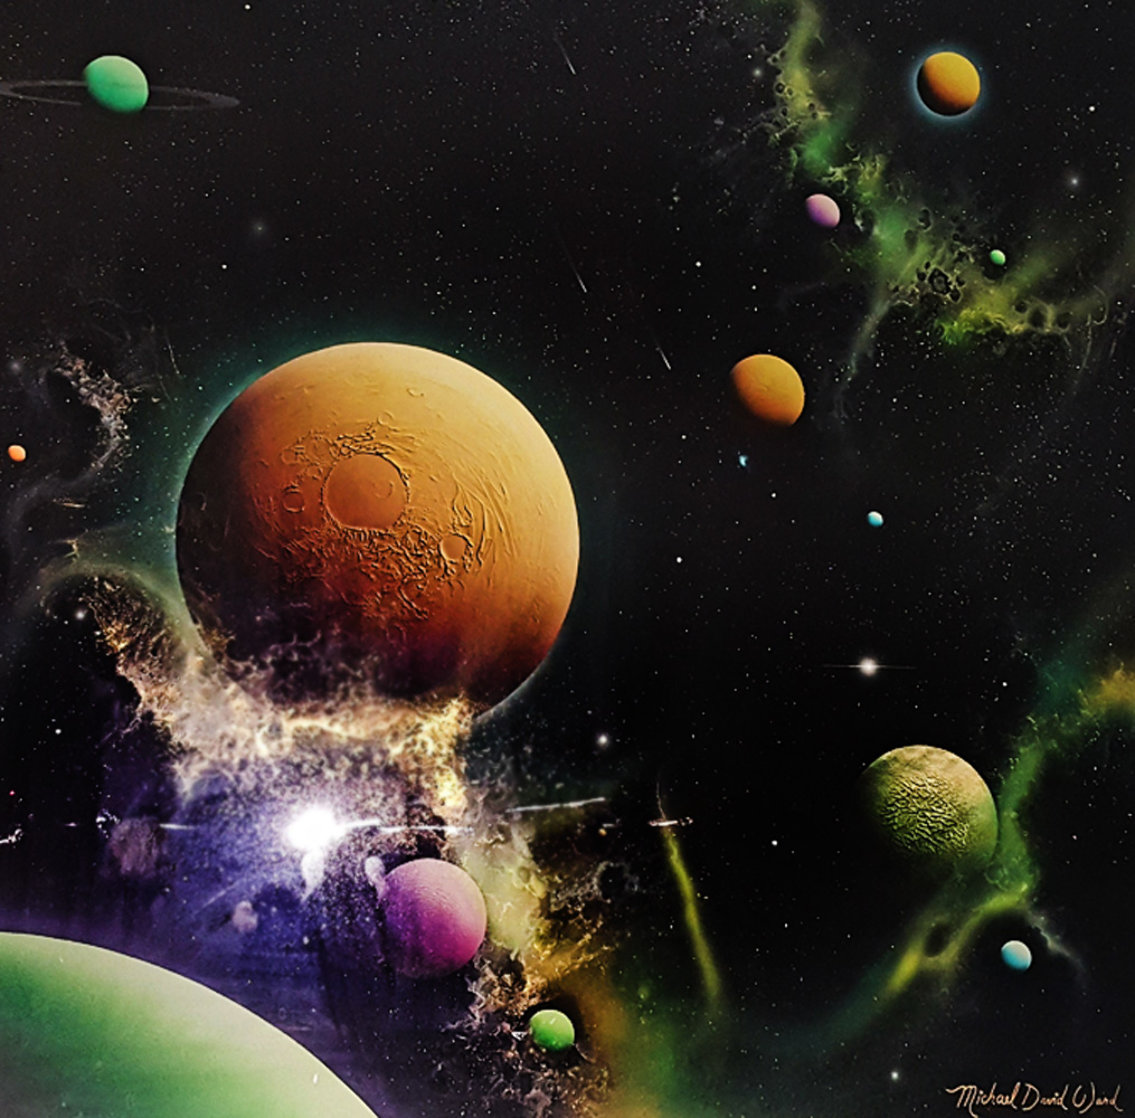 Golden Moon Dust 1993 36x36 Original Painting by Michael David Ward